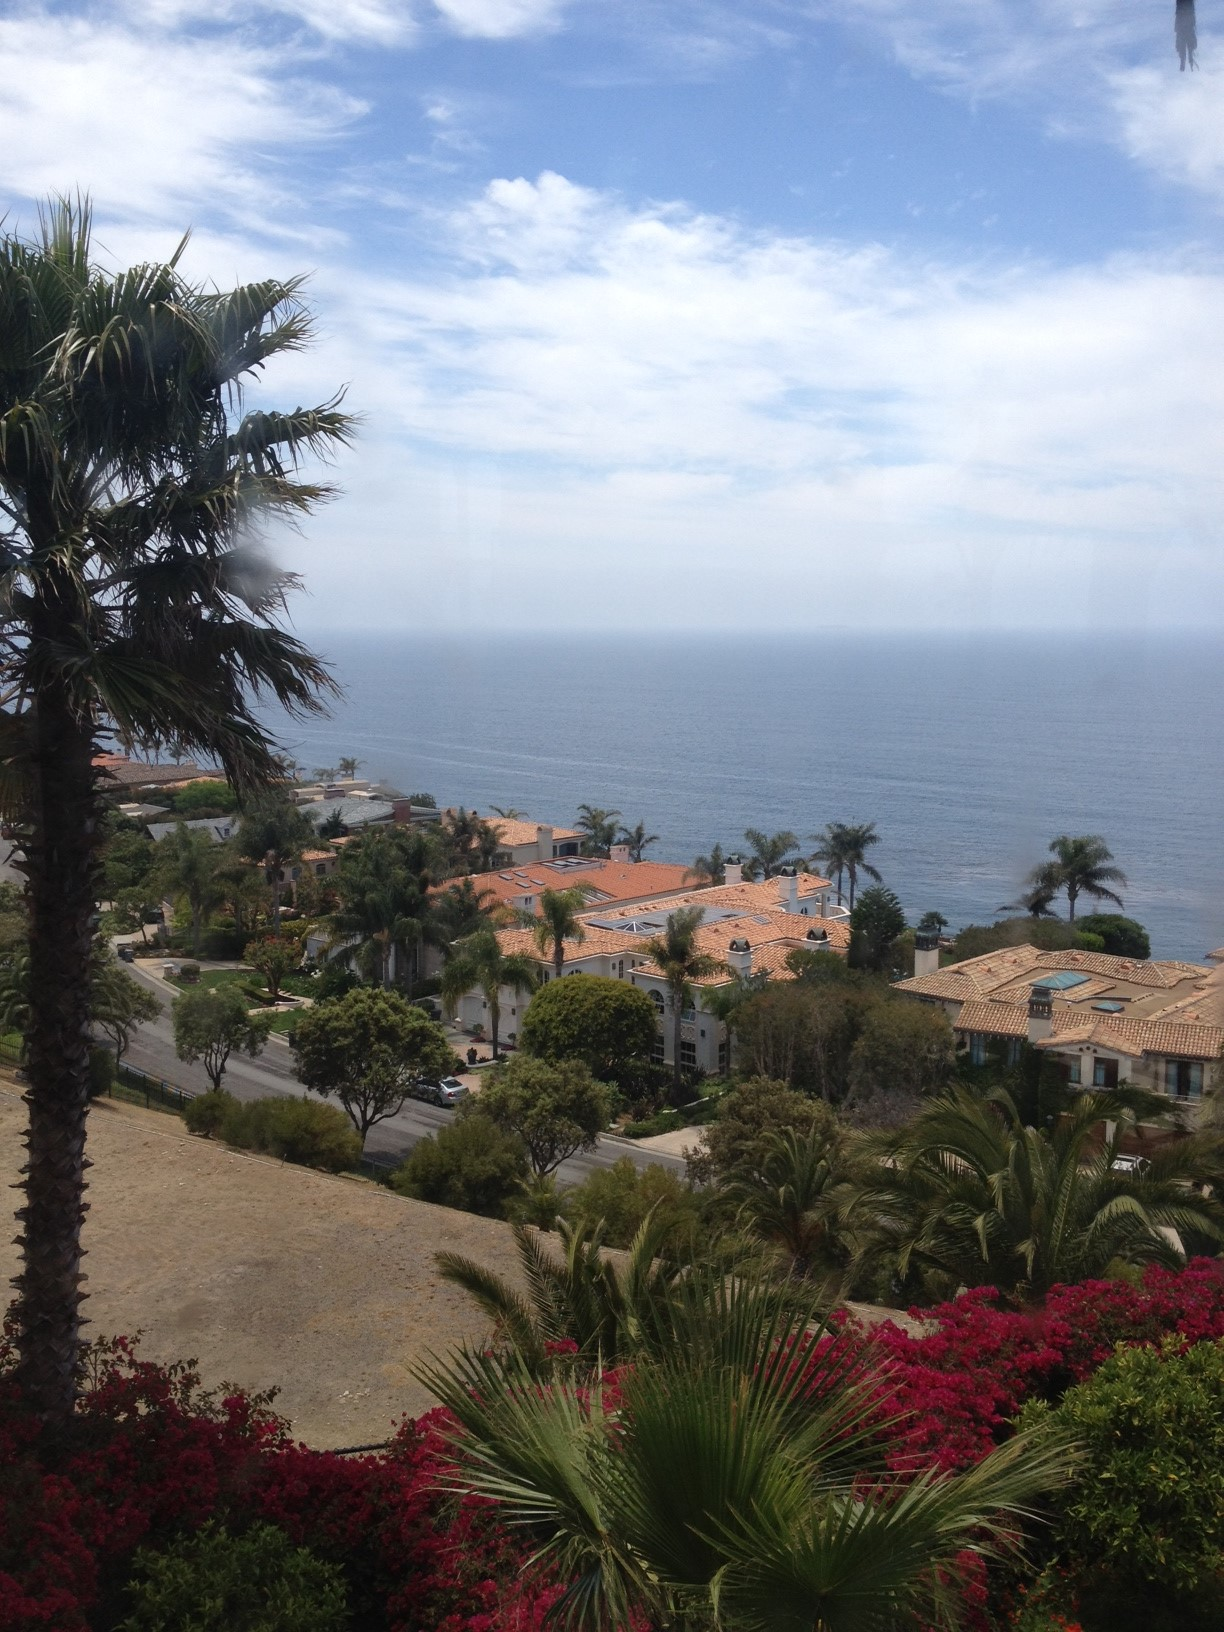 170 Luxury homes along the Palos Verdes coastline 2